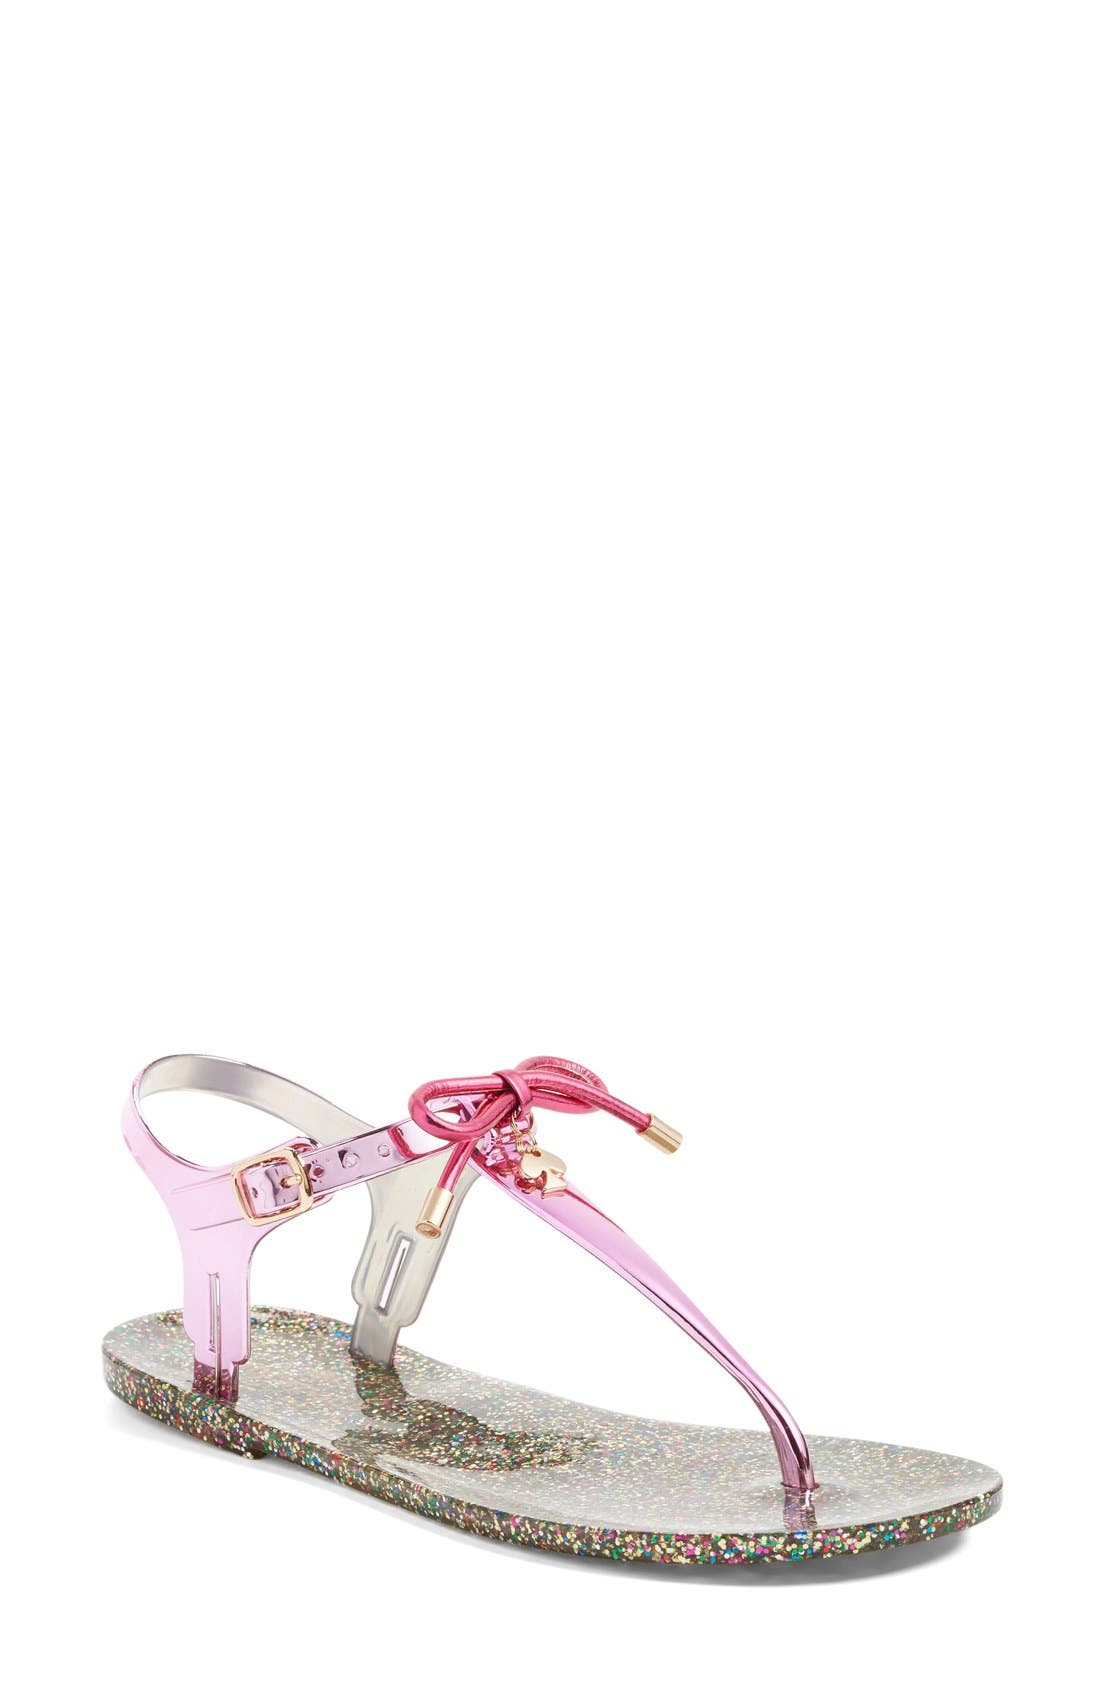 kate spade new york fanley t-strap sandal (Women)